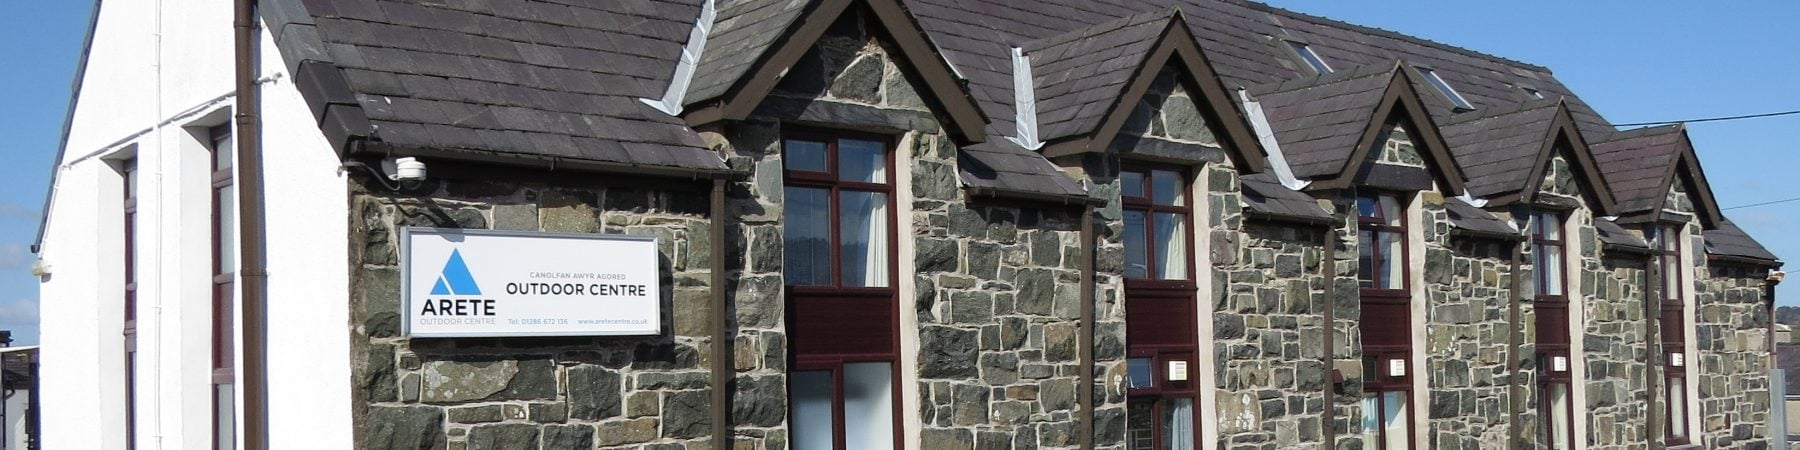 arete outdoor adventure centre accommodation